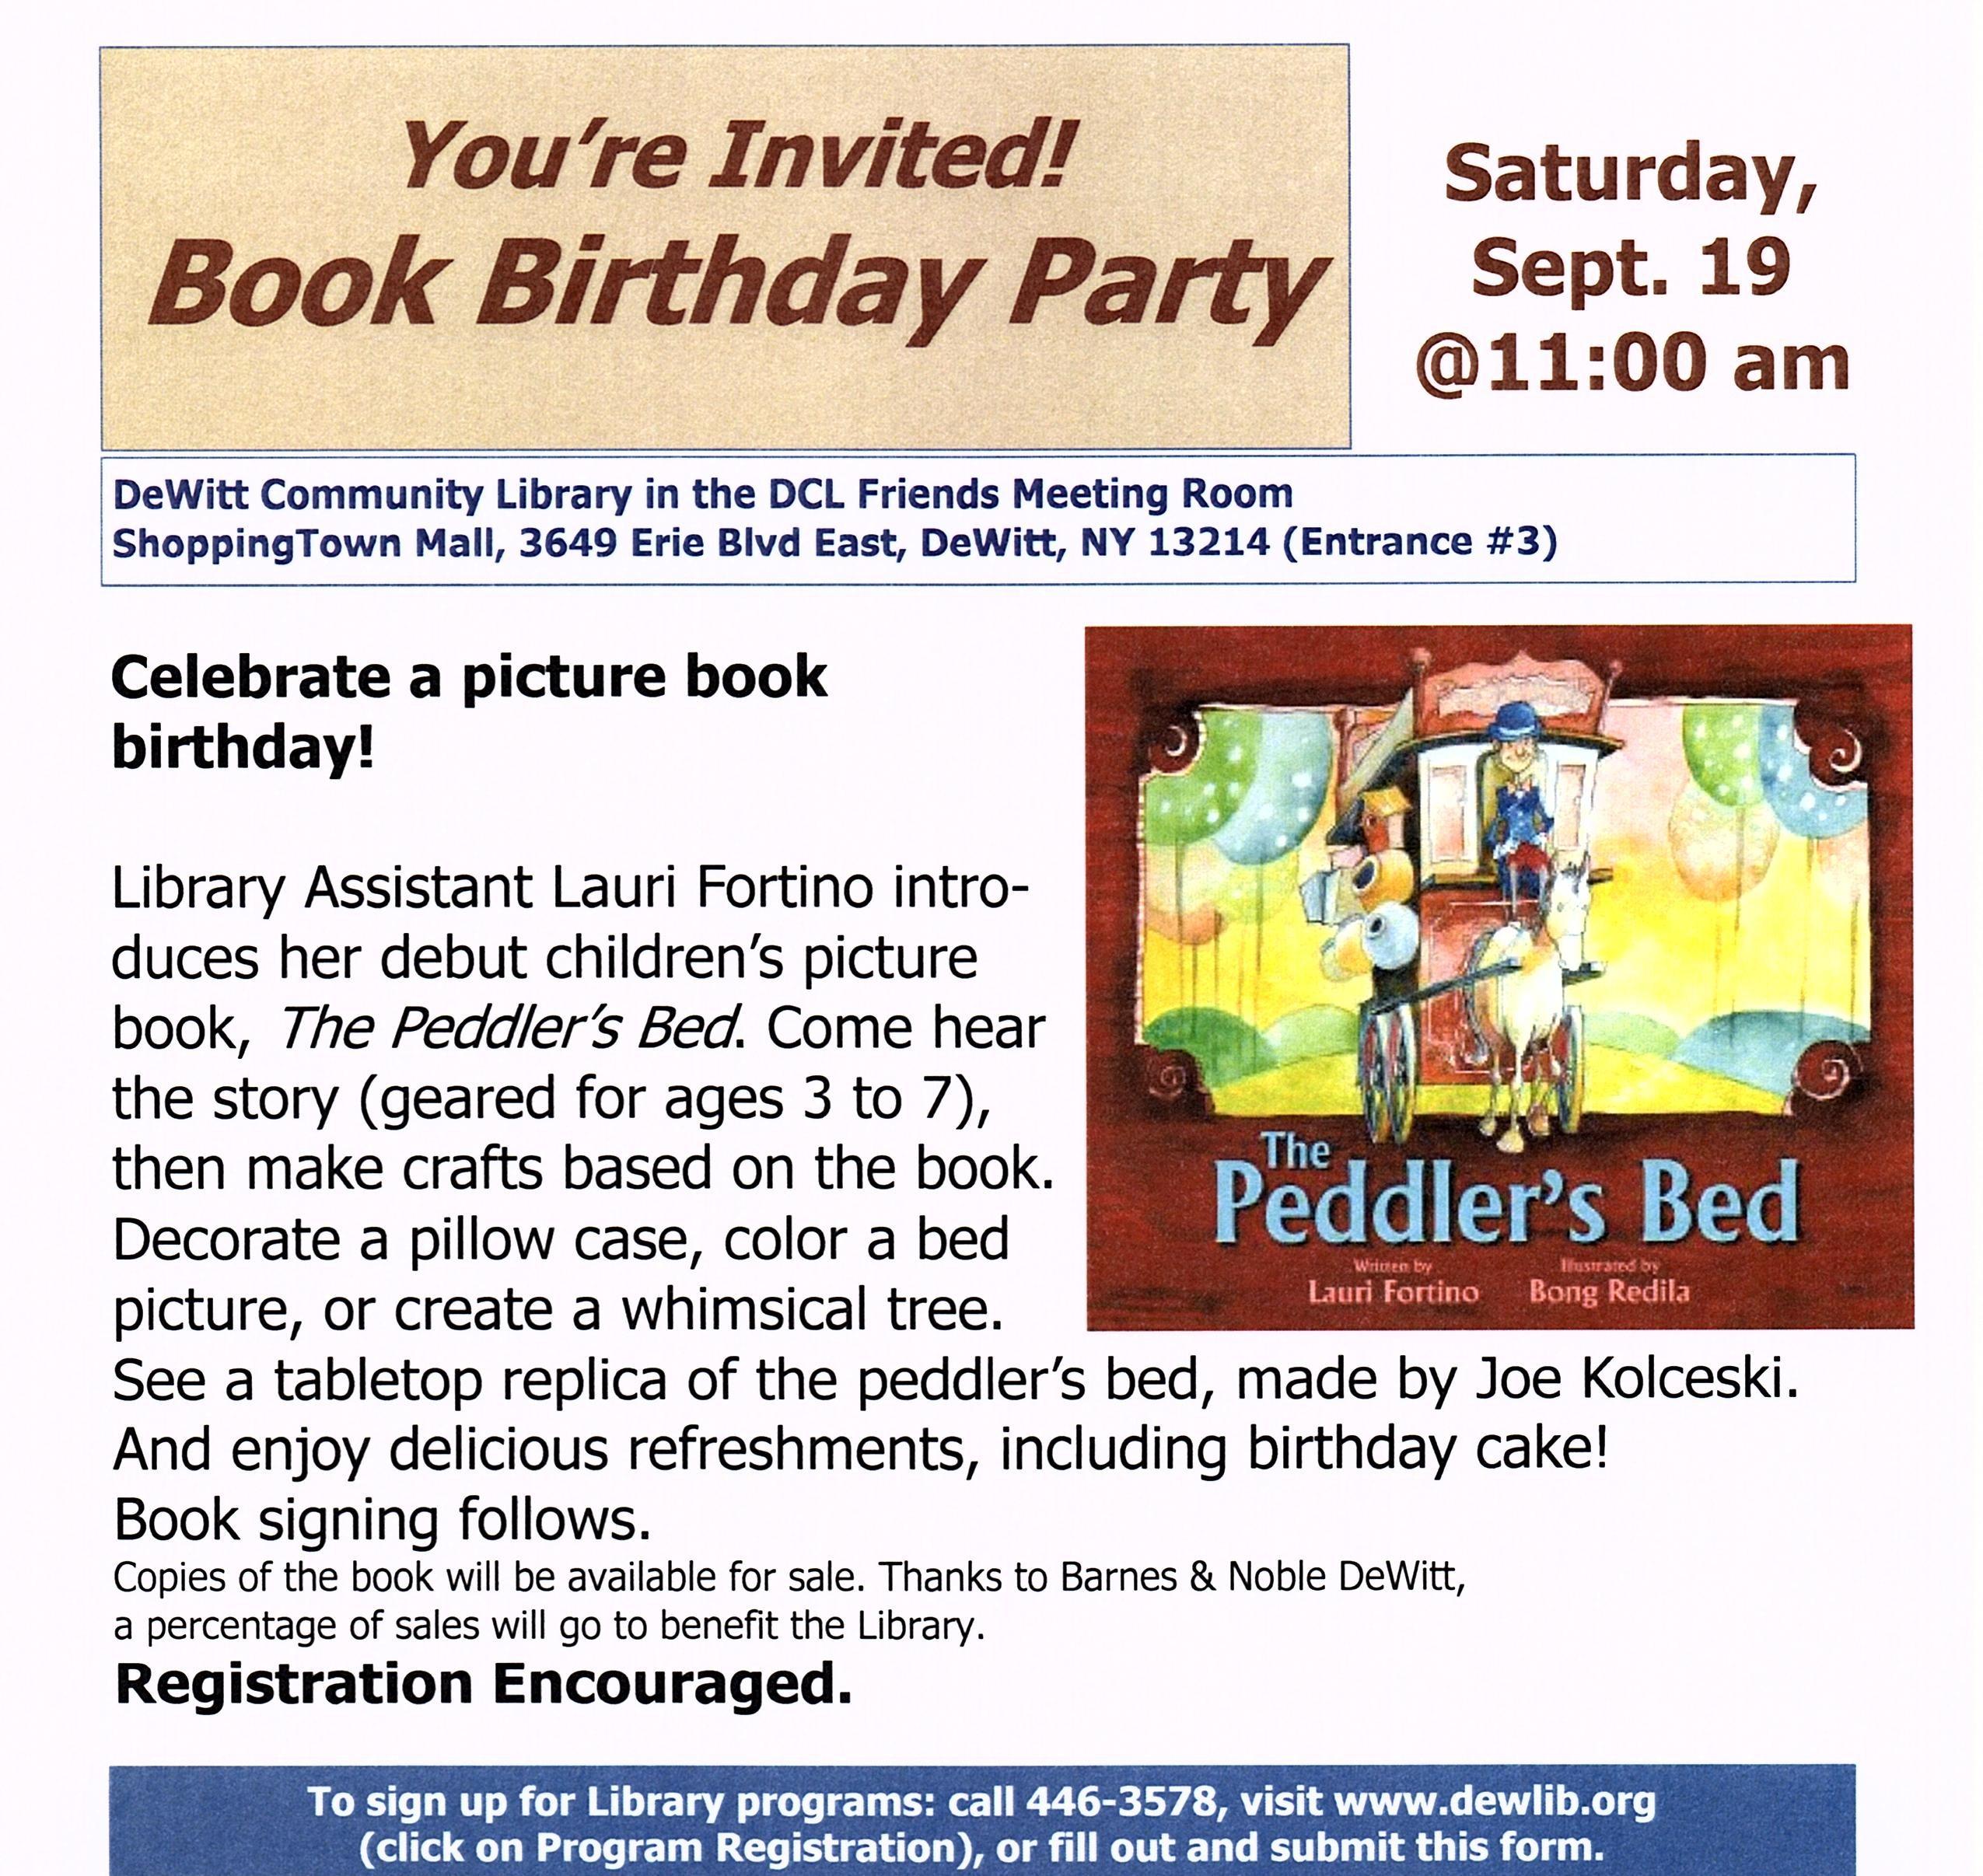 Garcia Winner Books Book Birthday Party